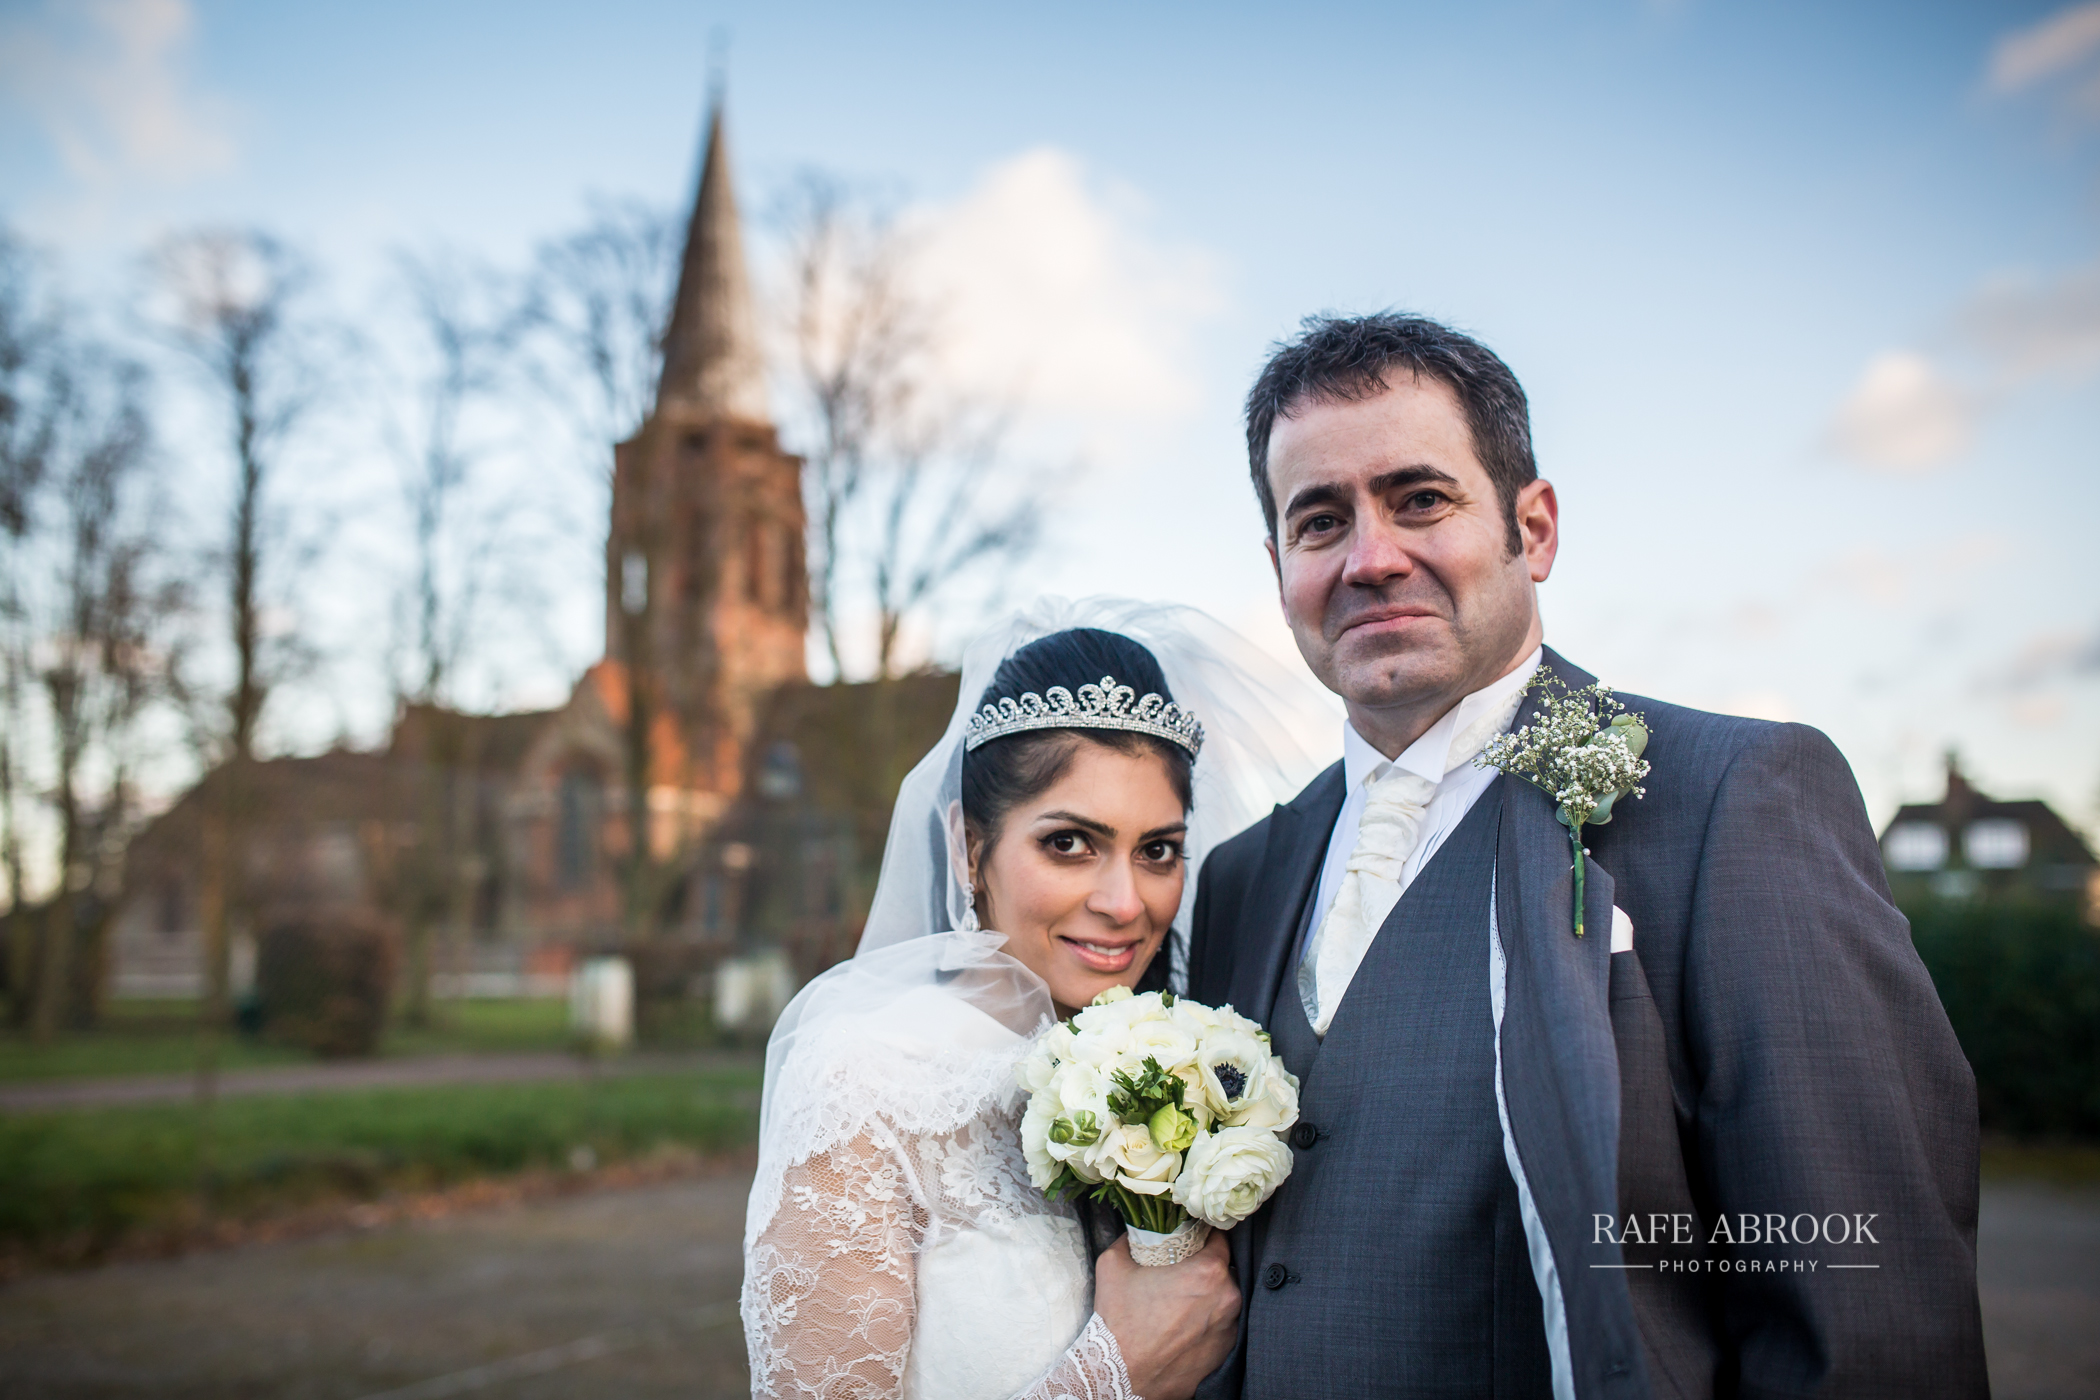 roma & pete wedding hampstead shenley hertfordshire -331.jpg